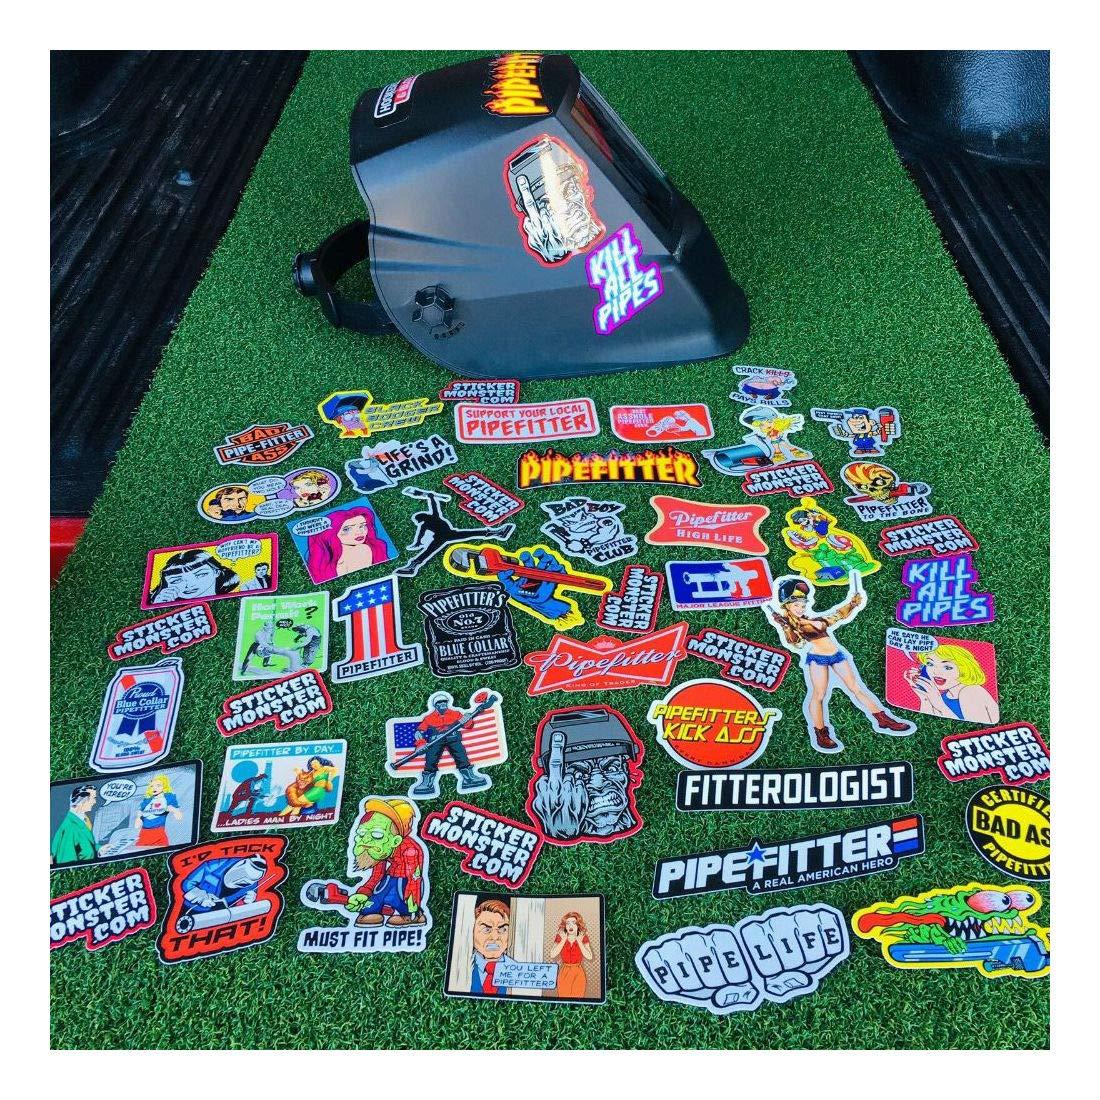 Pipefitter Welder (40) Hard Hat Stickers Hardhat Sticker & Decals, Welding Hood- Sold by Mike's Garage Sale Today! by Unknown